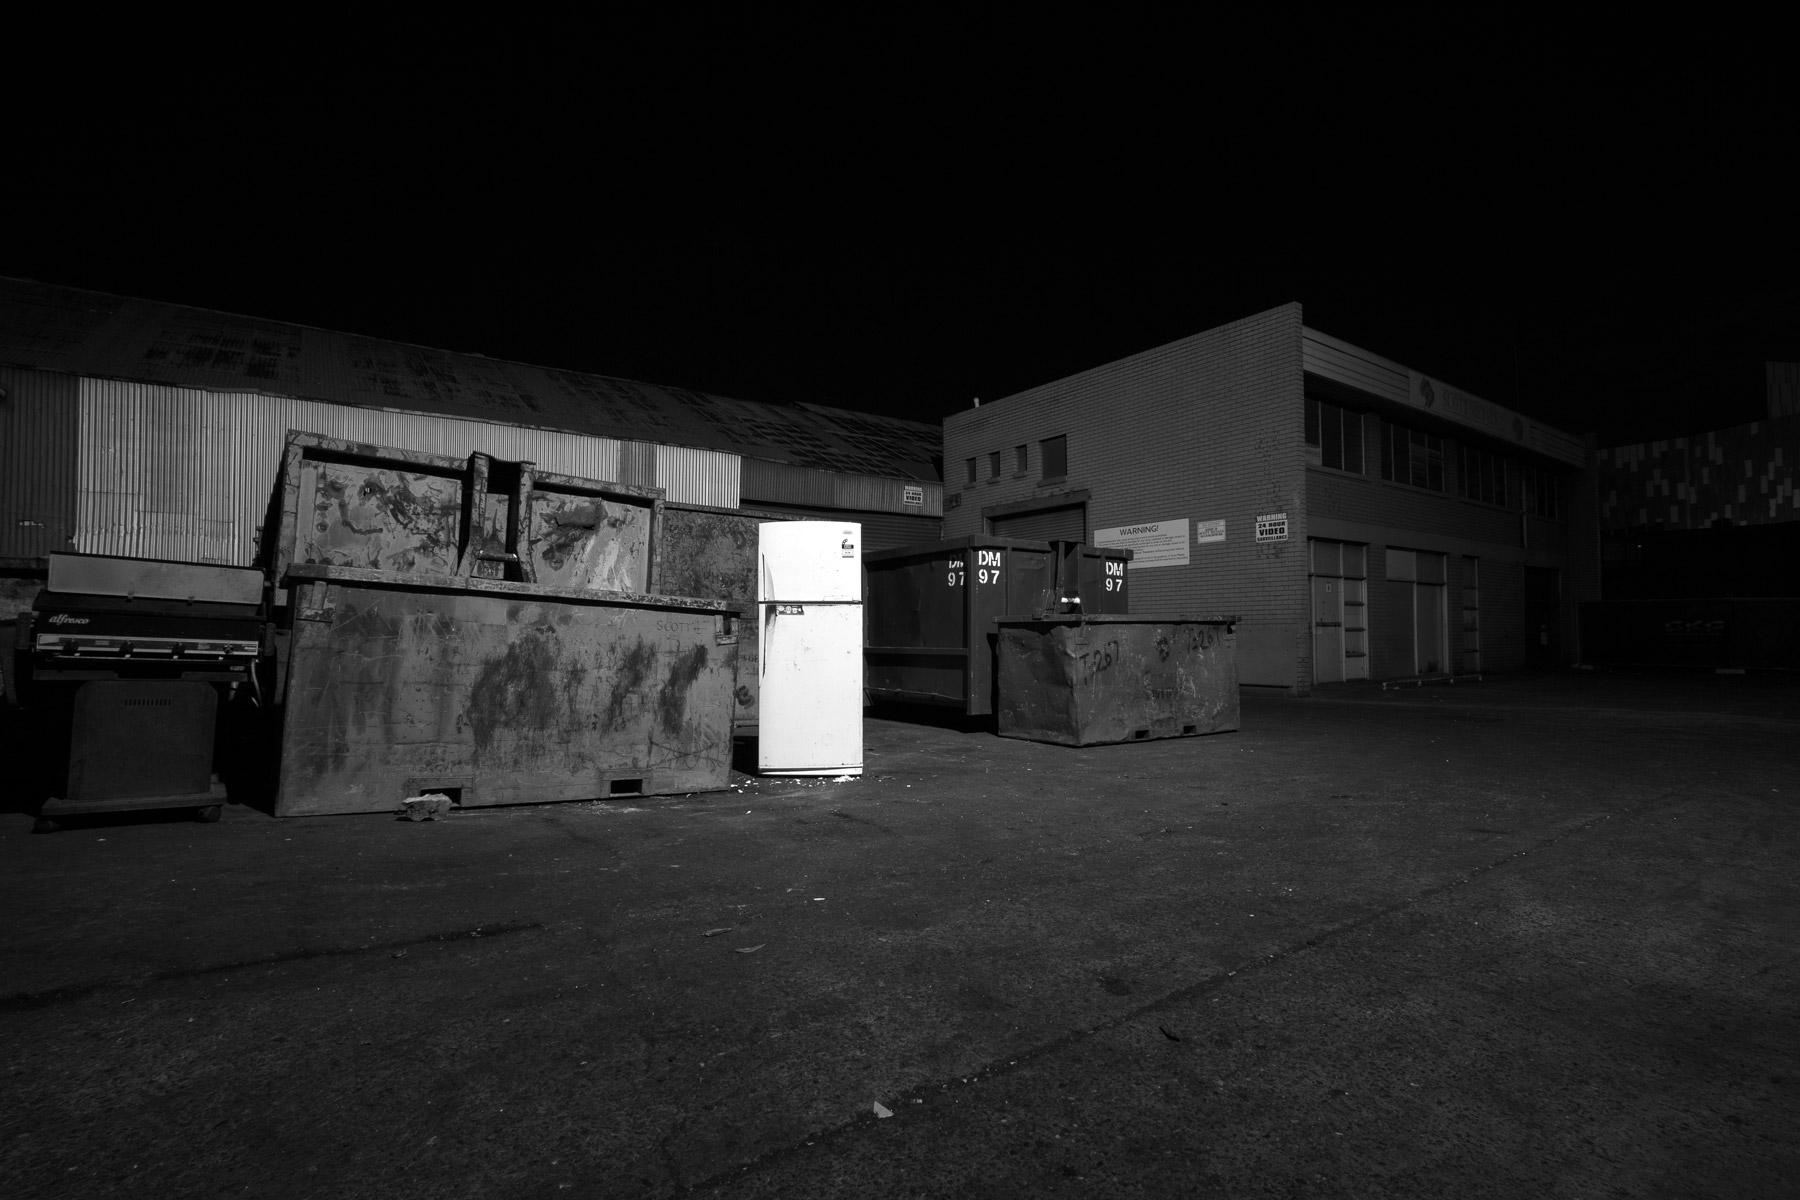 A fridge outside at night in Woolloongabba, Brisbane